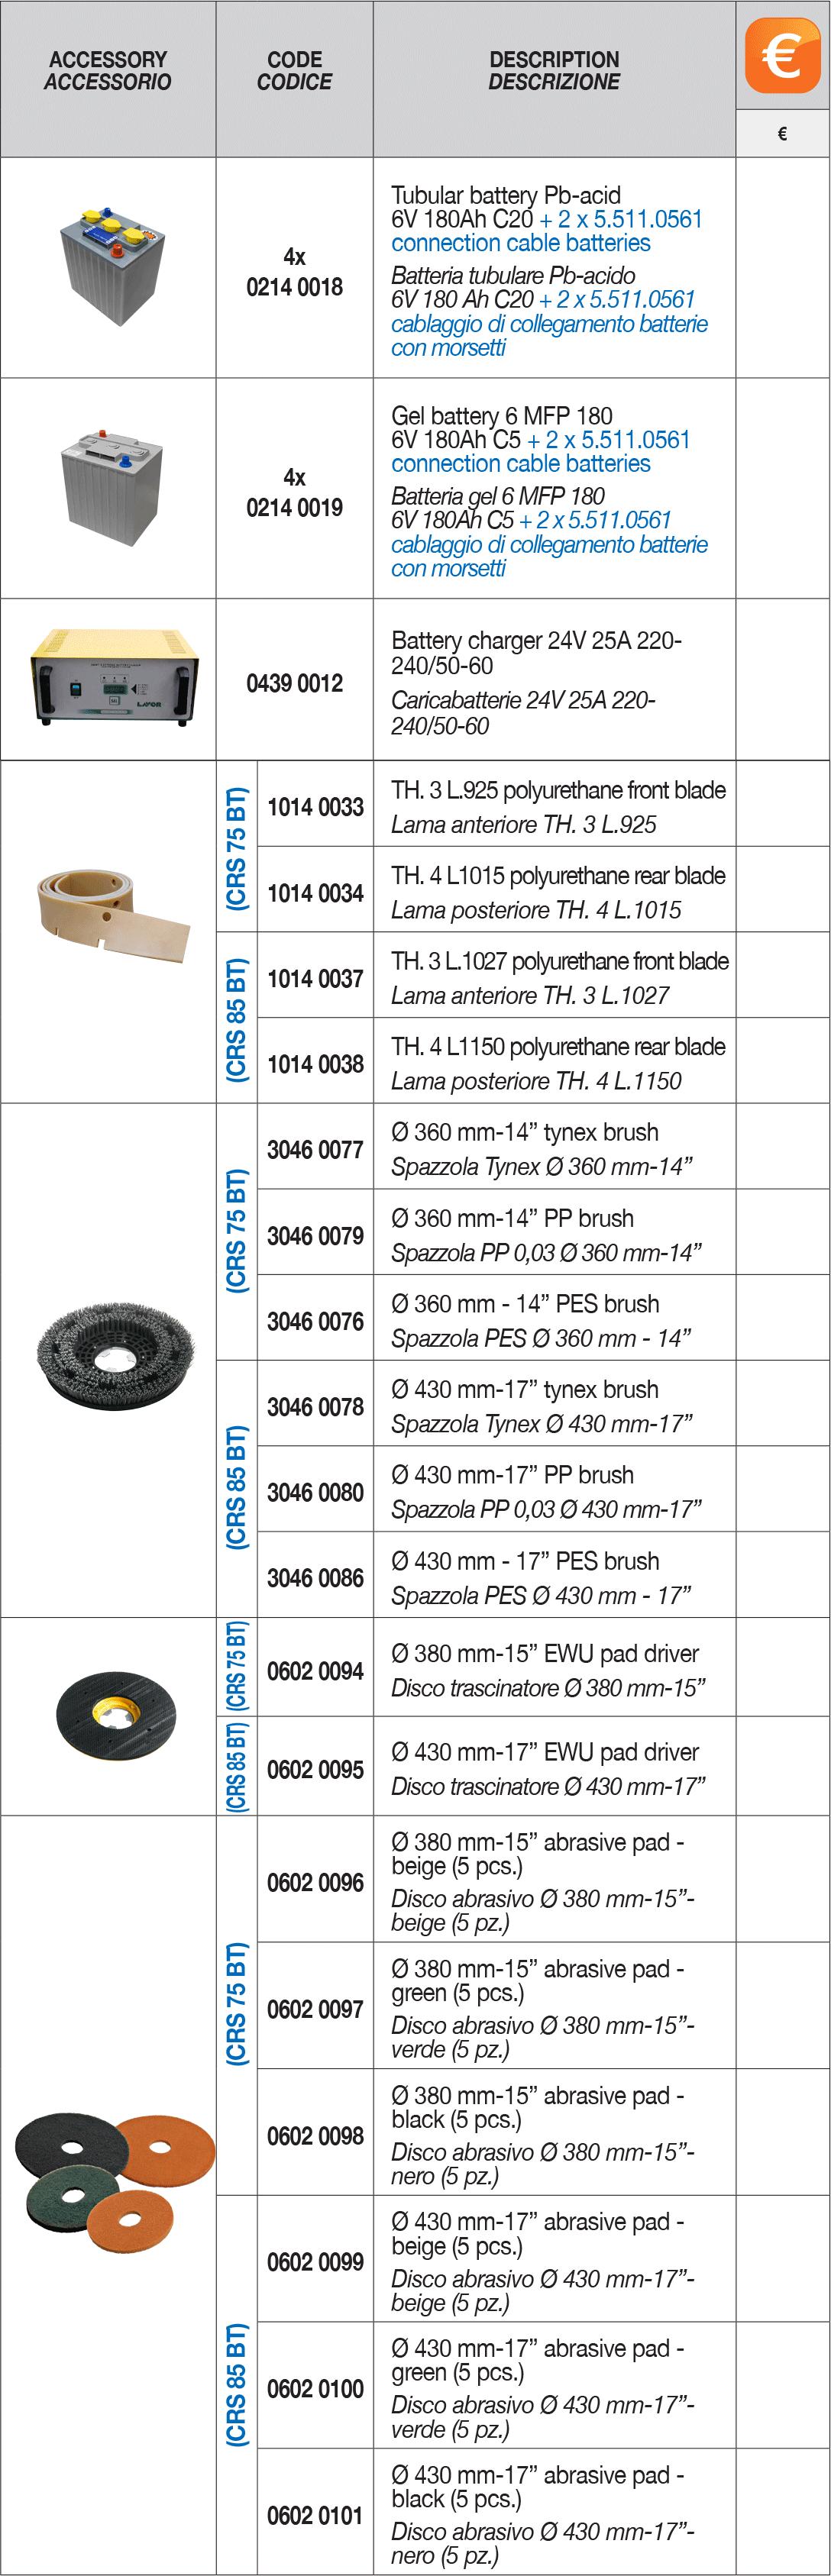 crs 75 85 bt optional accessories Comet